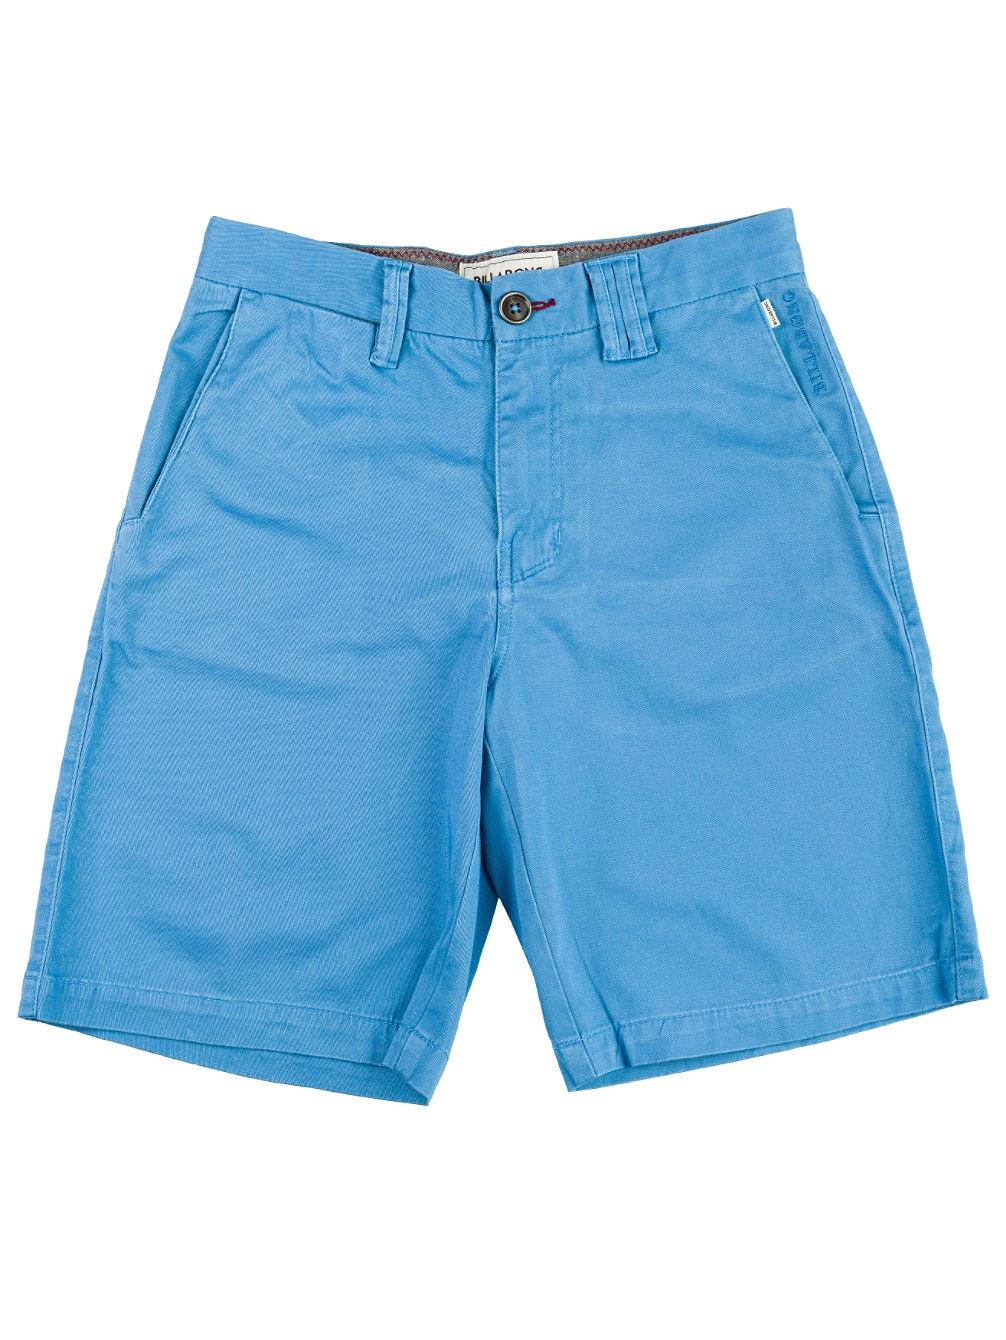 new-order-shorts-boys